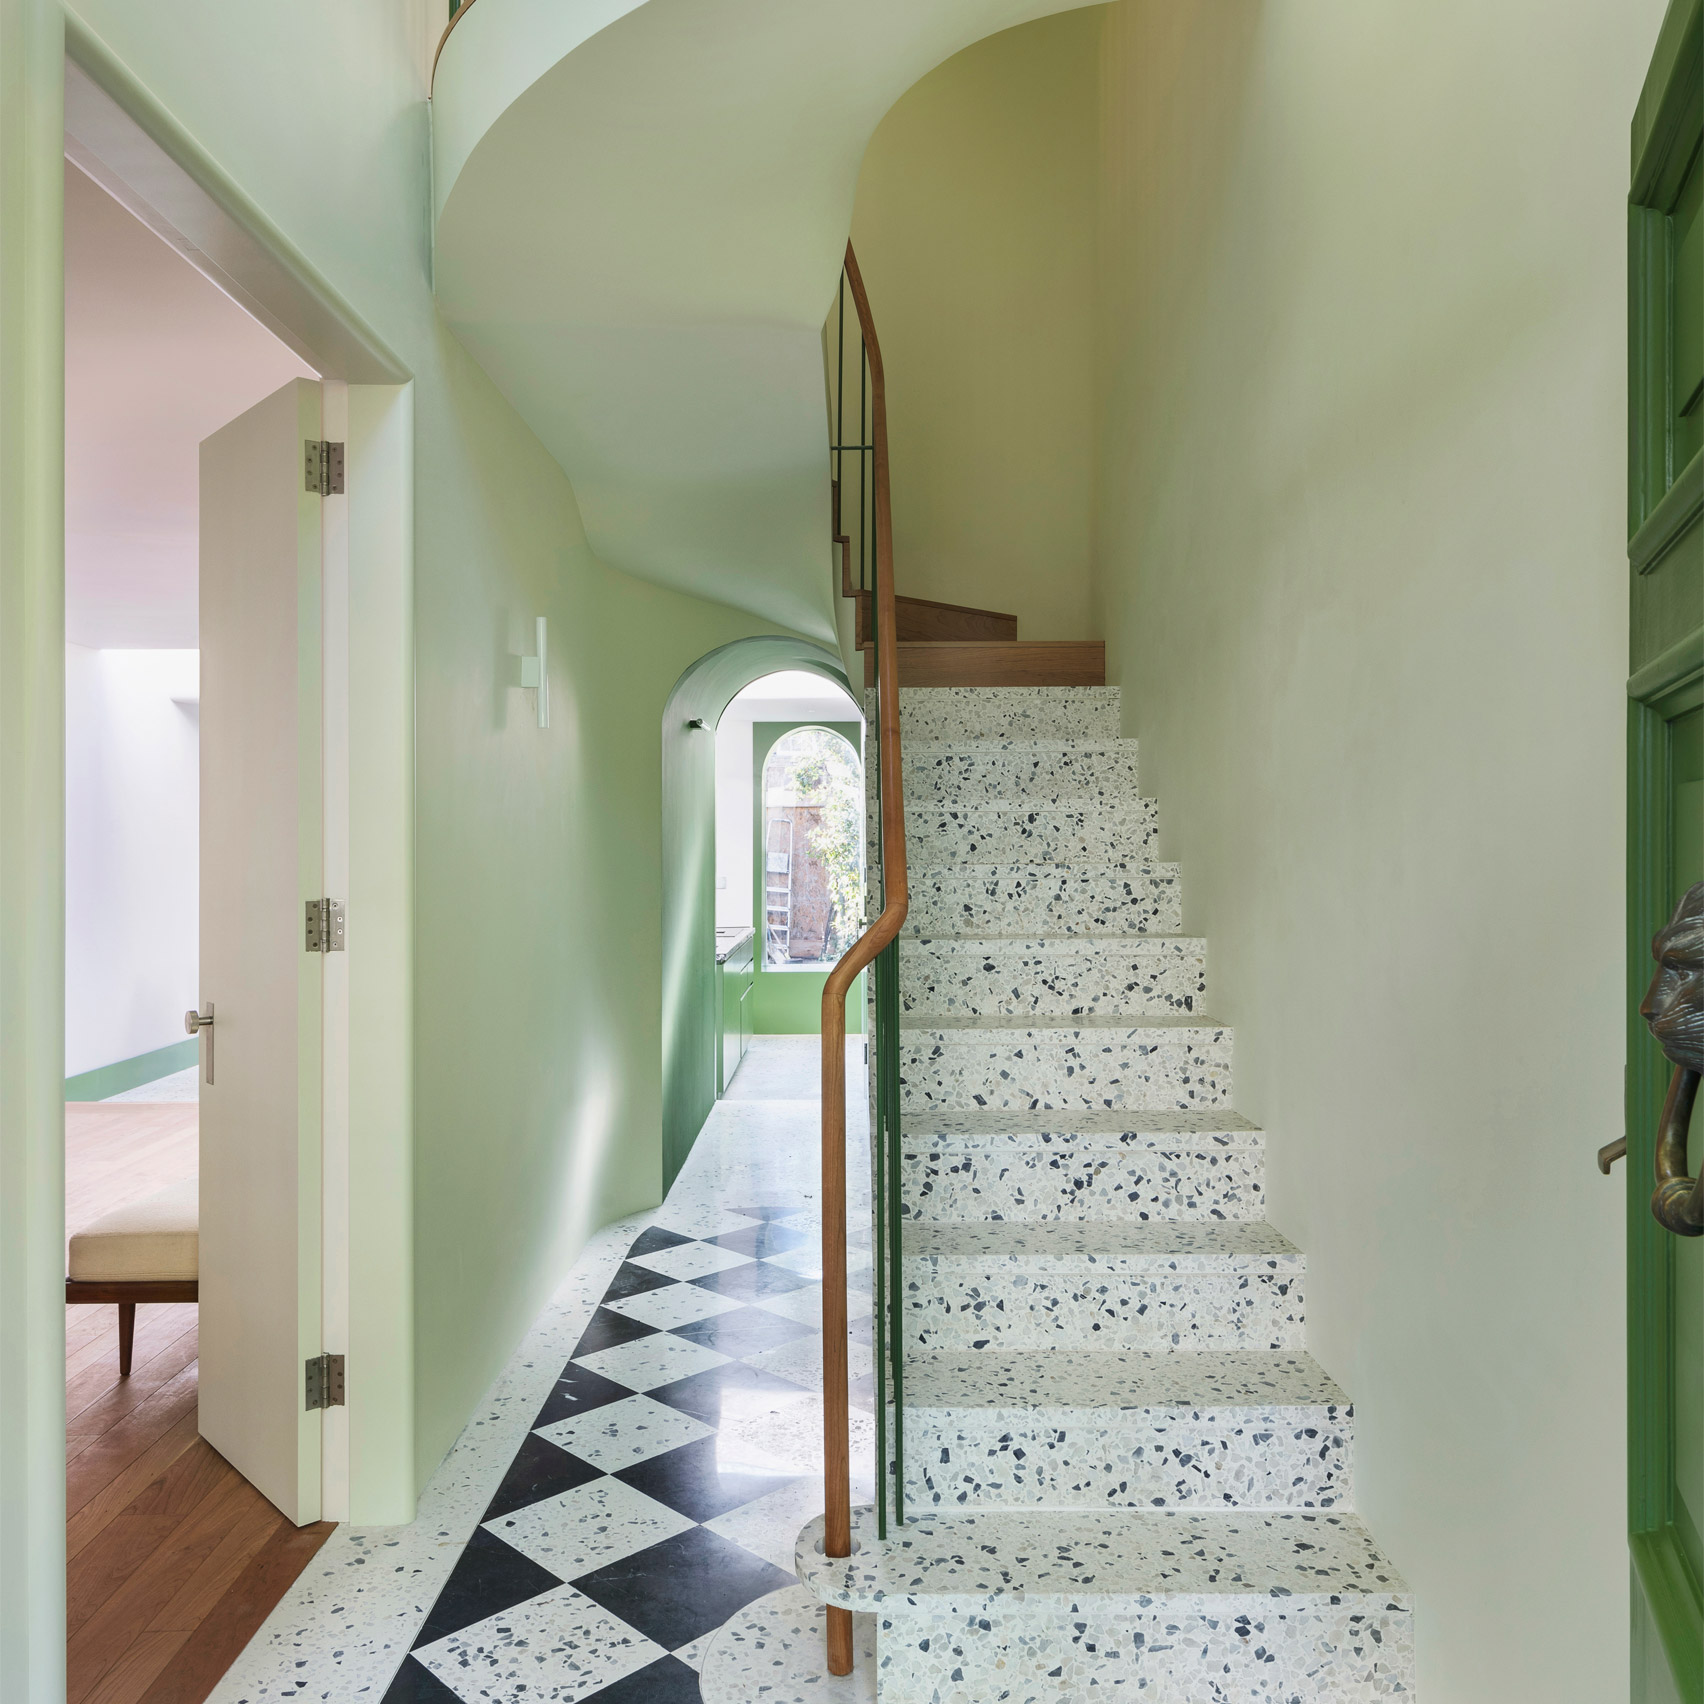 The White Rabbit House, Islington, by Gundry + Drucker